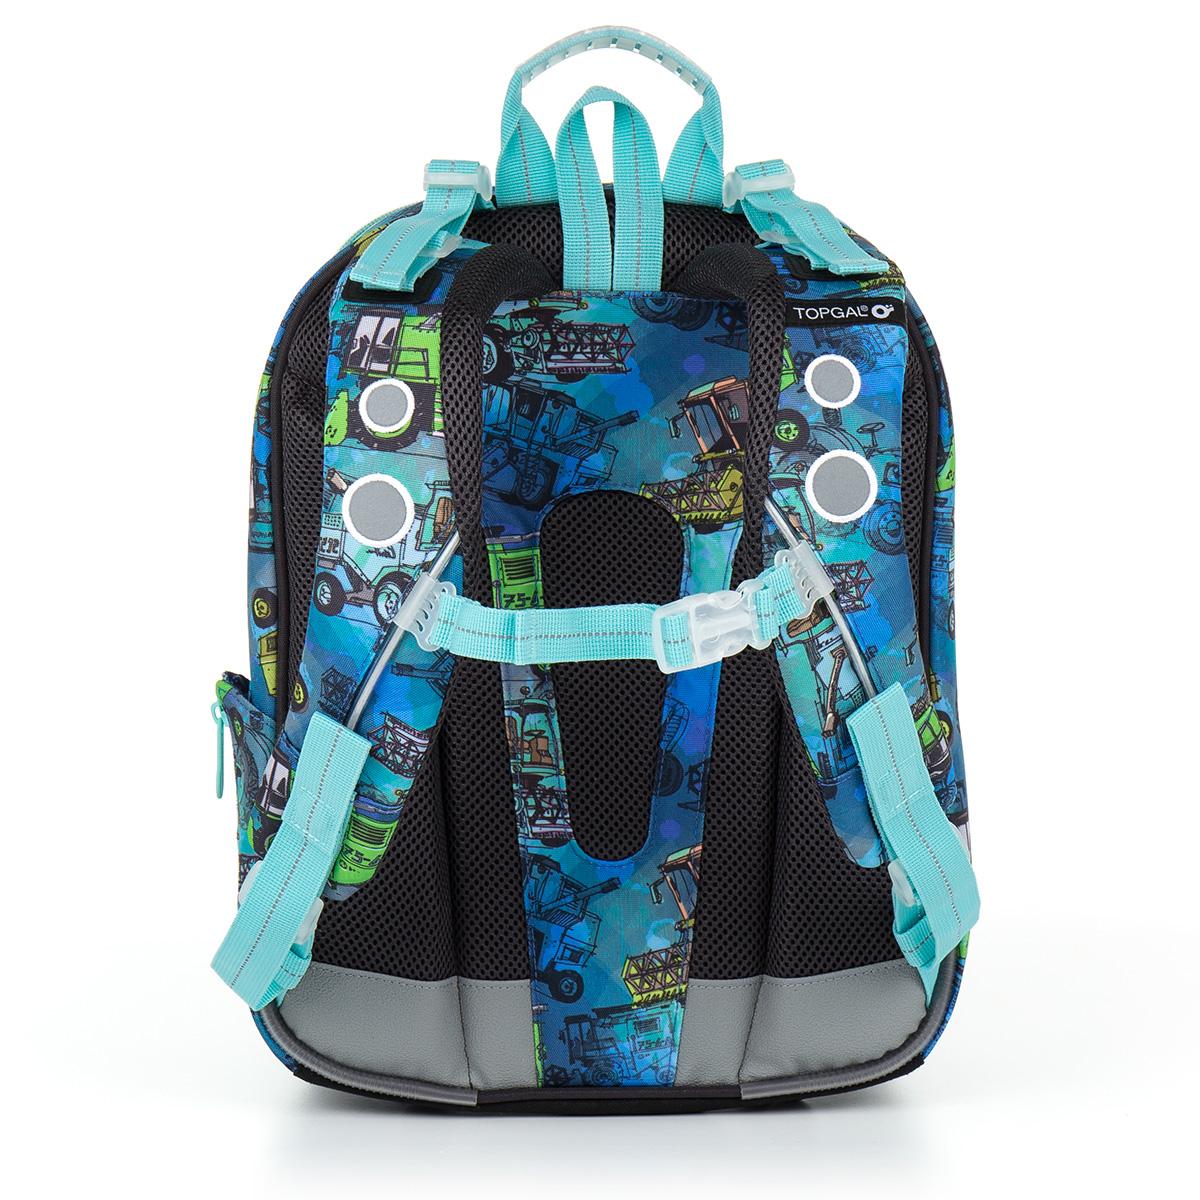 44ef78bcd93 Školní aktovka batoh Topgal CHI 885 D - Blue Kombajn